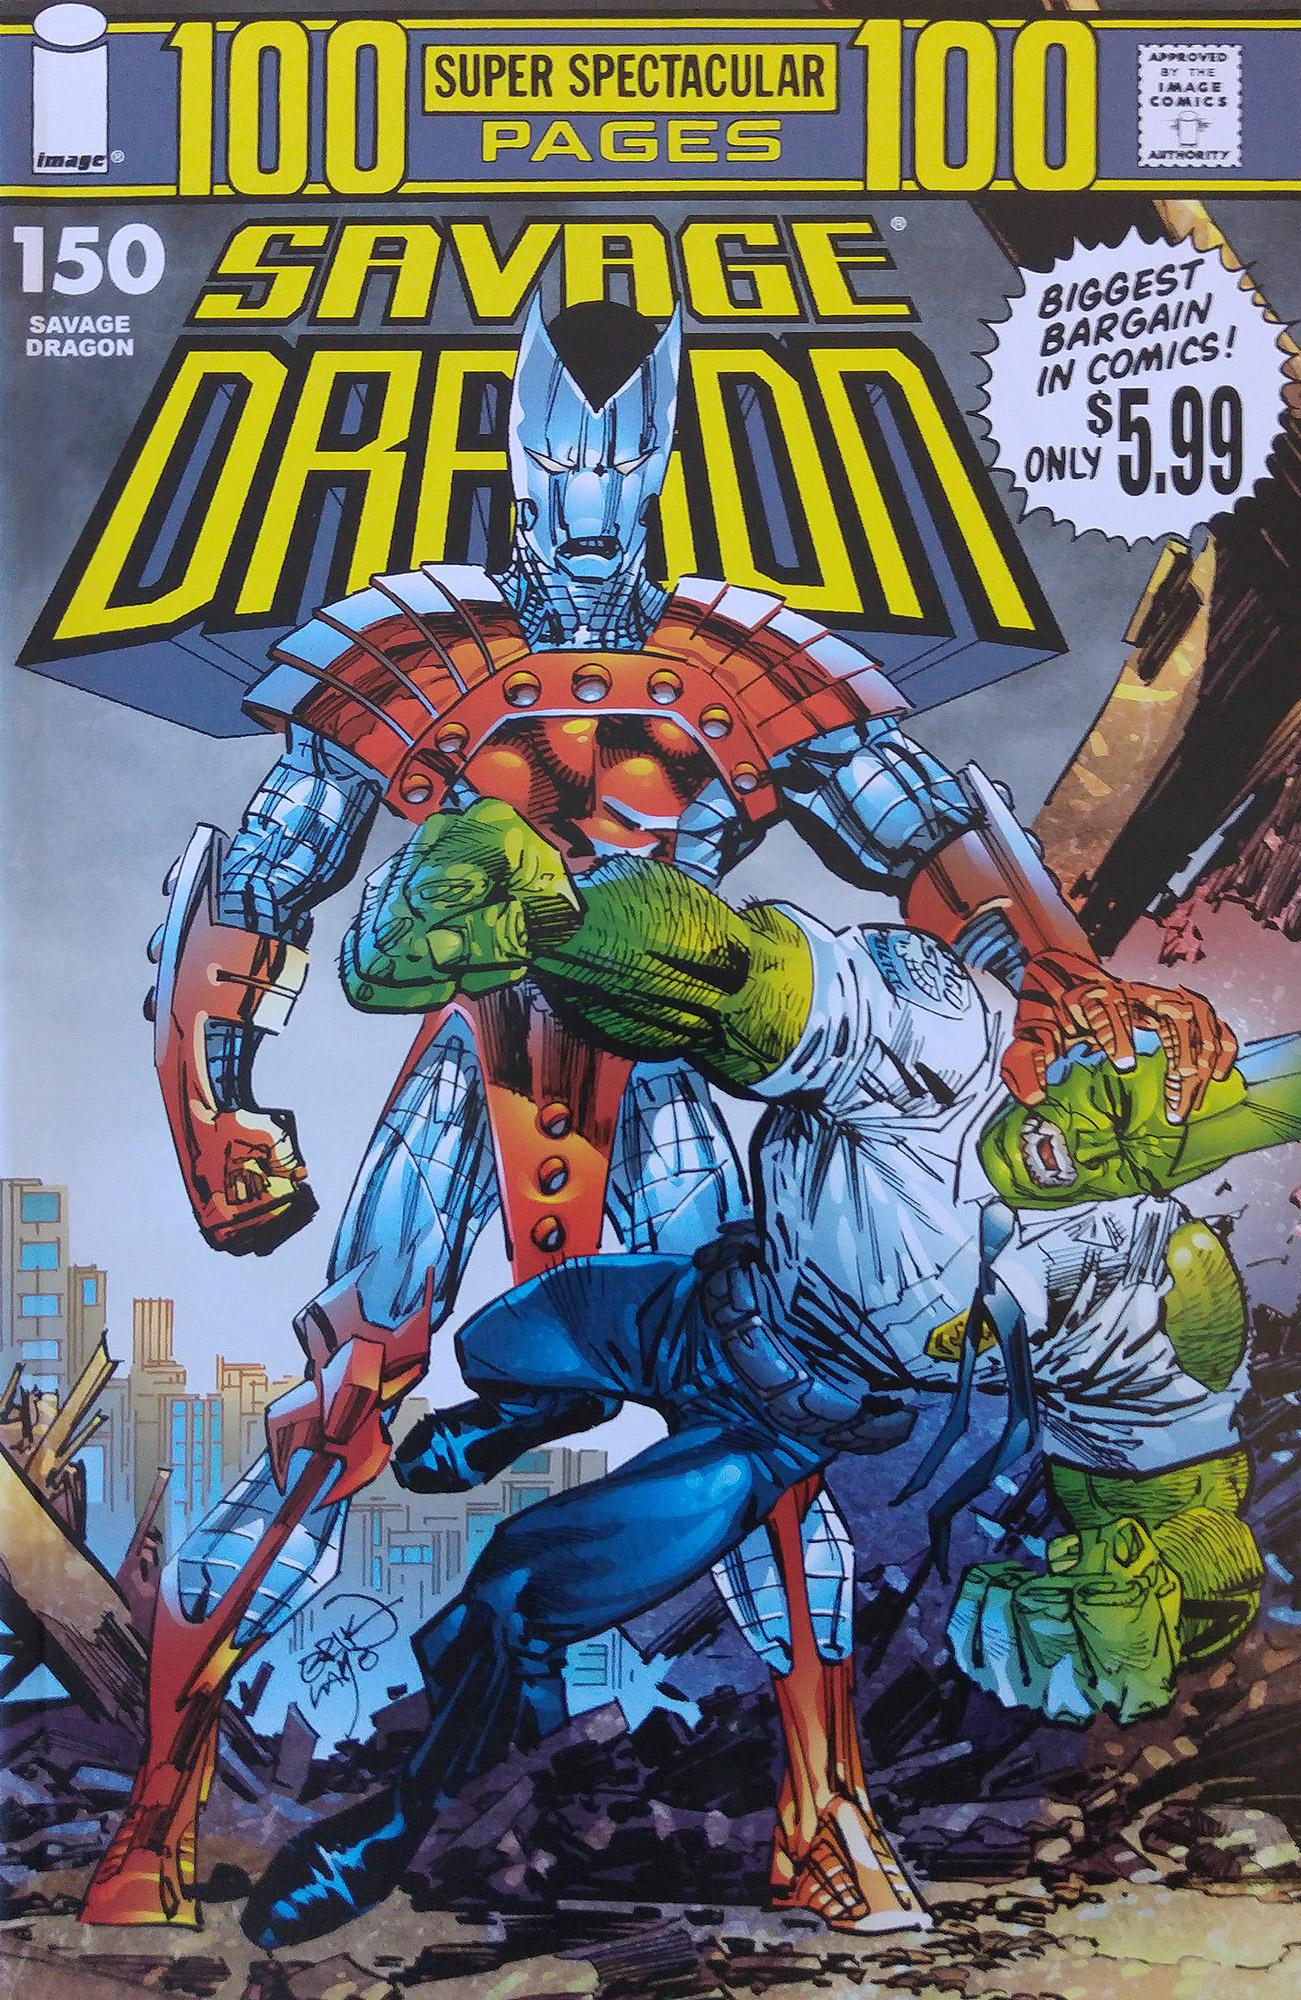 Cover Savage Dragon Vol.2 #150 Variant